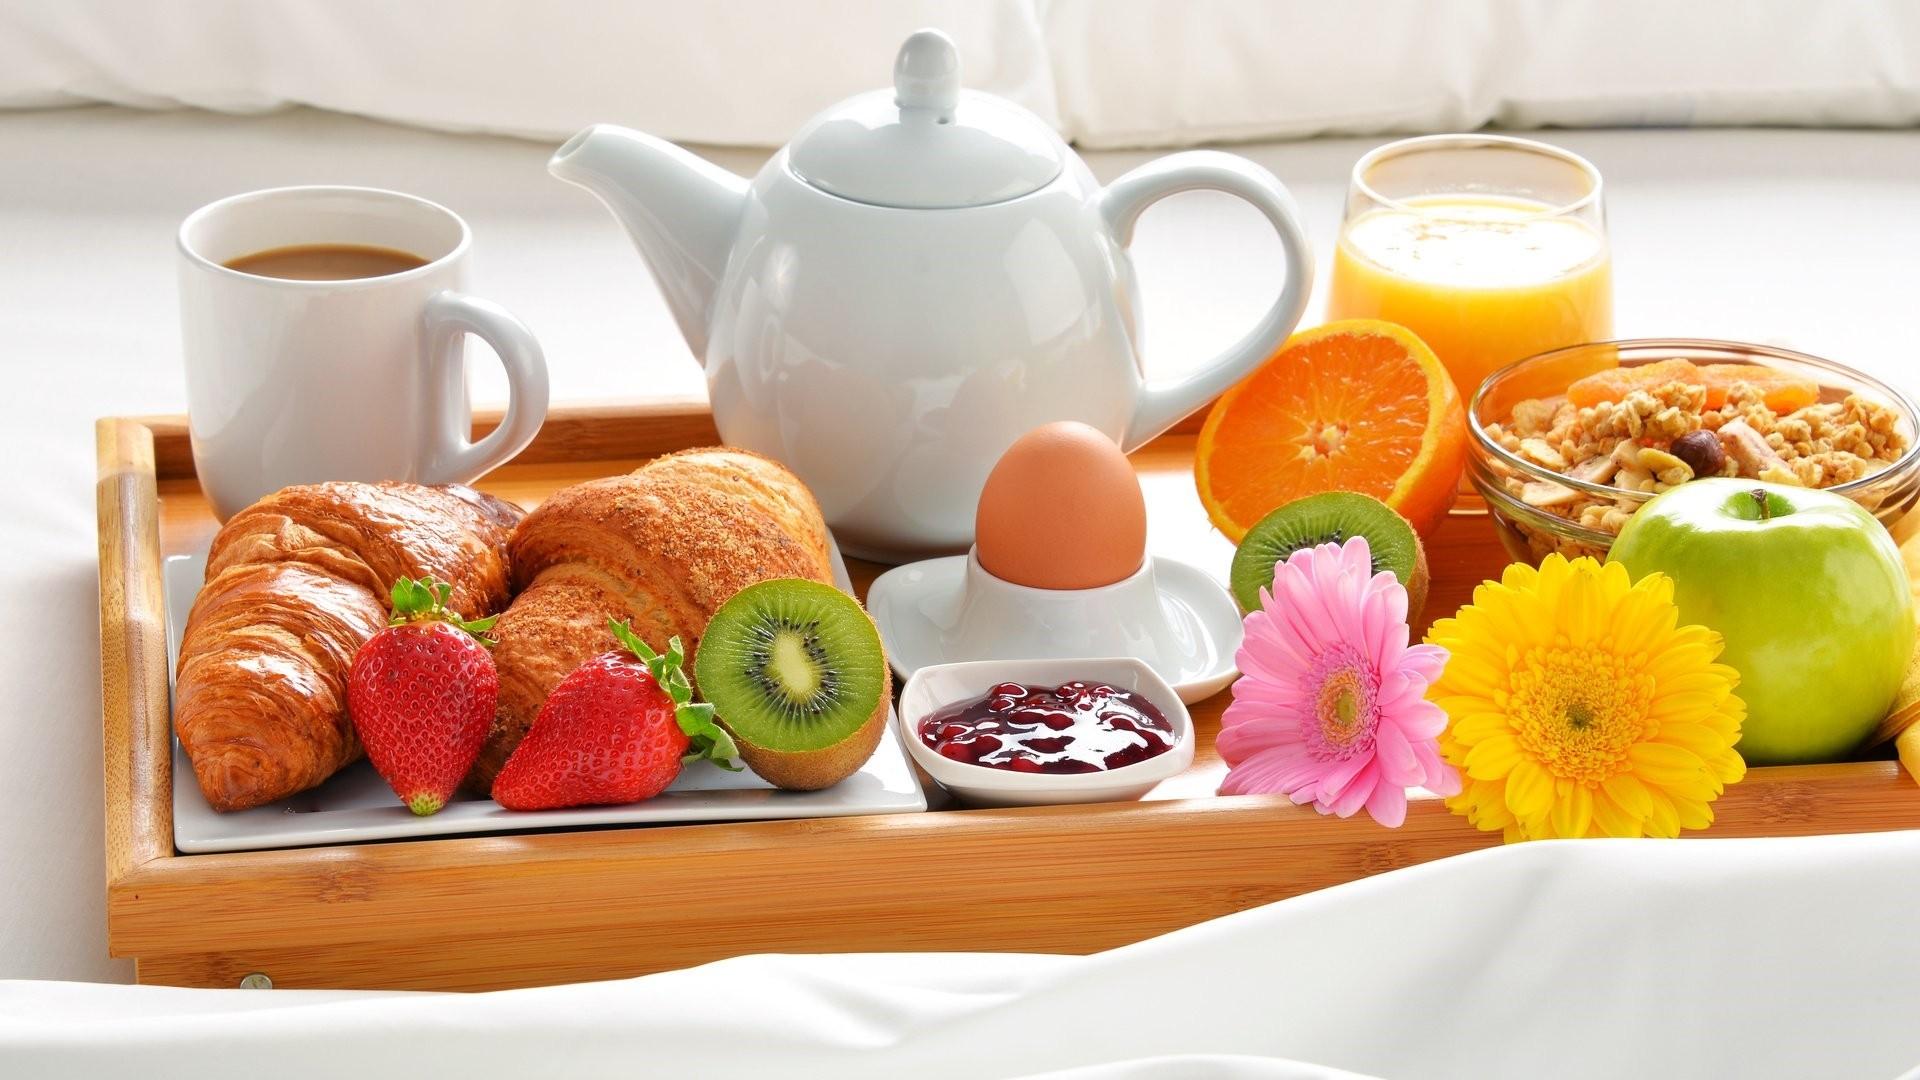 Breakfast wallpaper for pc